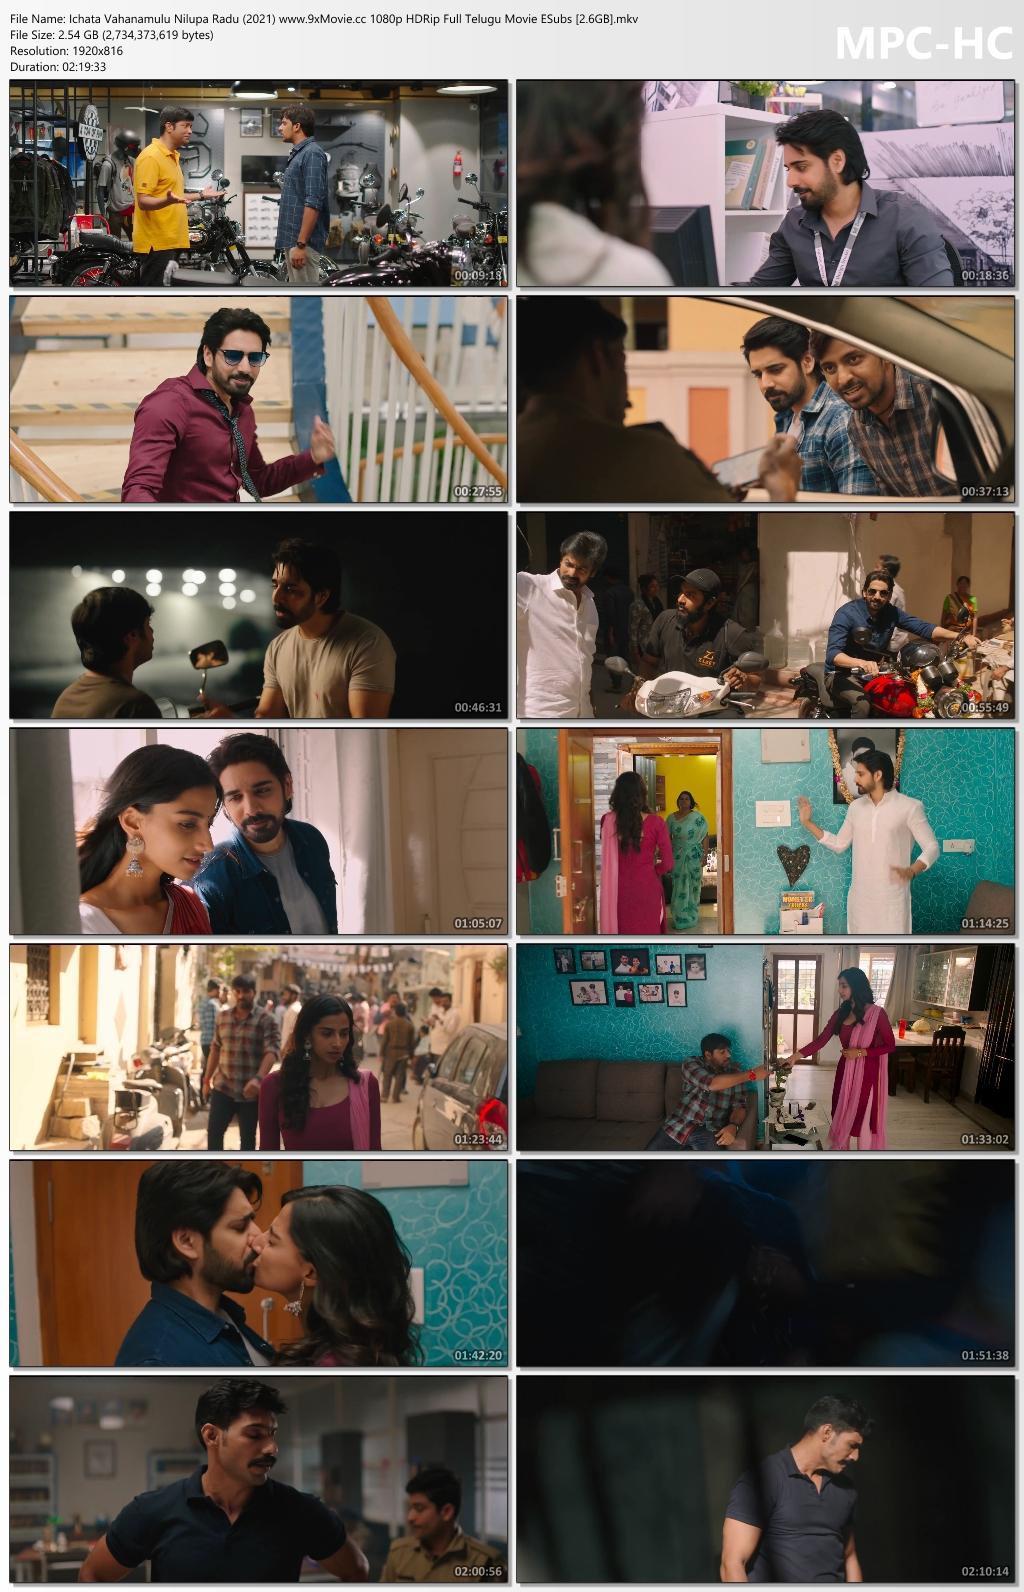 Ichata-Vahanamulu-Nilupa-Radu-2021-www-9x-Movie-cc-1080p-HDRip-Full-Telugu-Movie-ESubs-2-6-GB-mkv